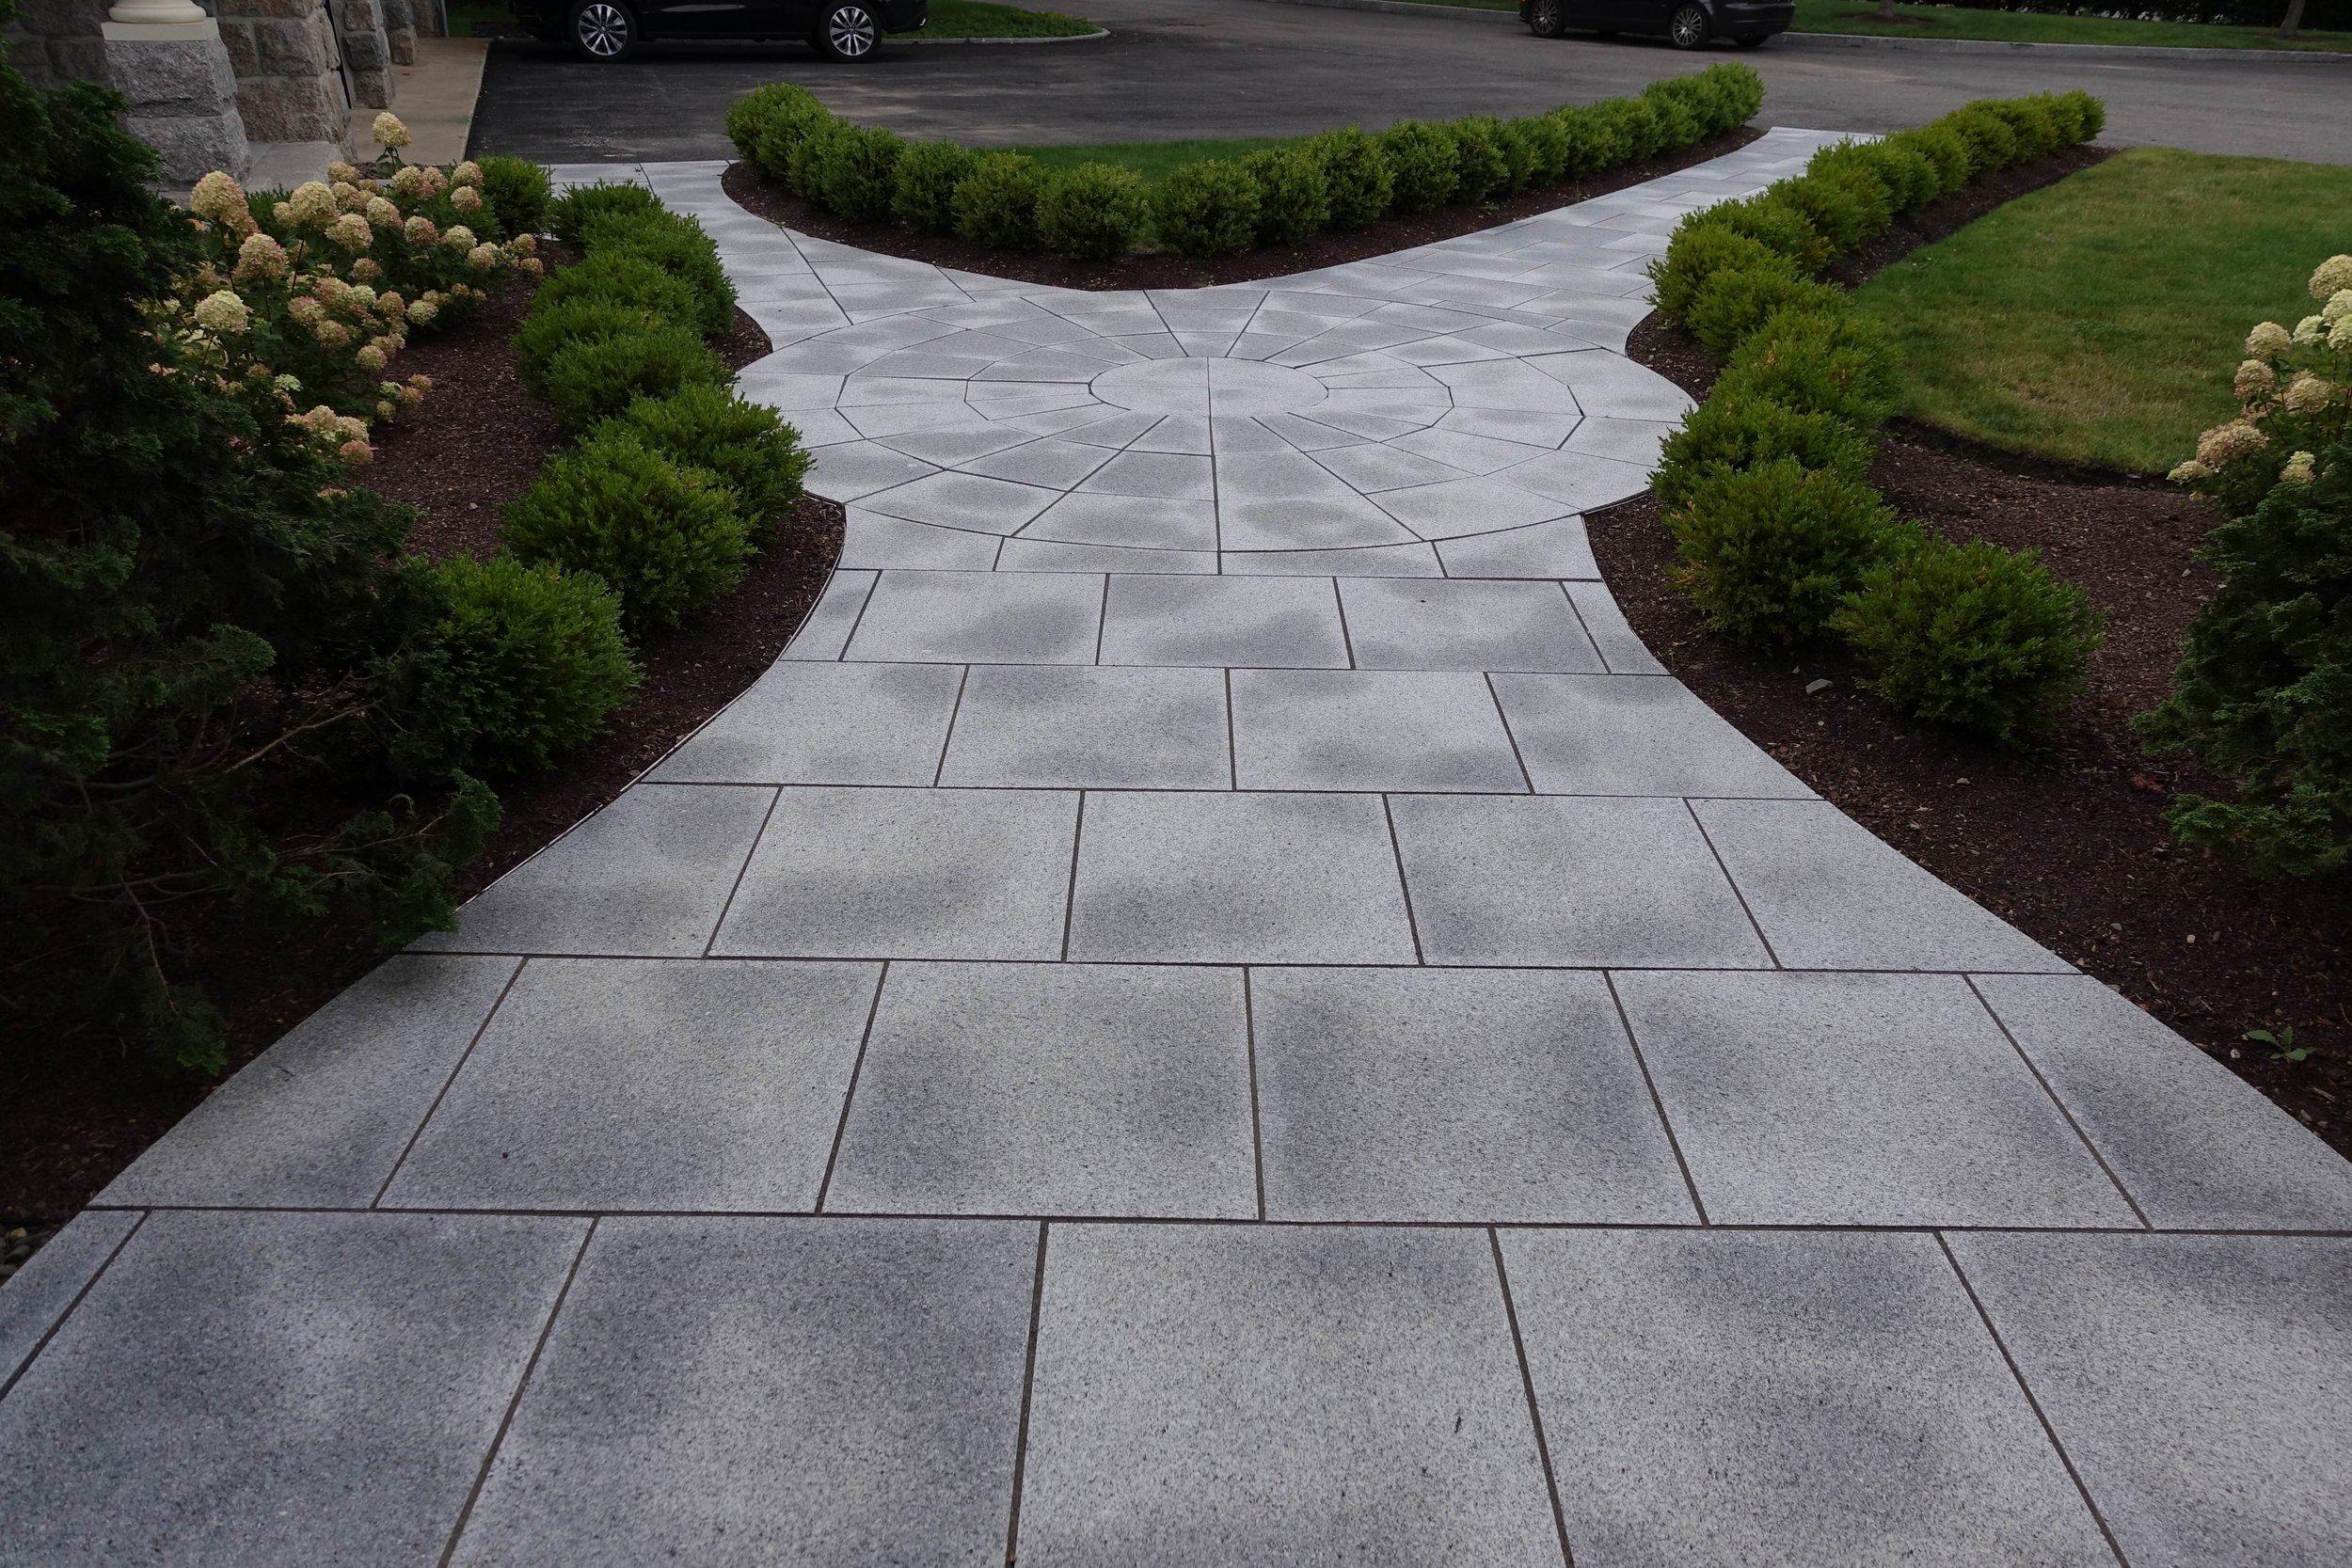 Granite Paver Pathway2.JPG